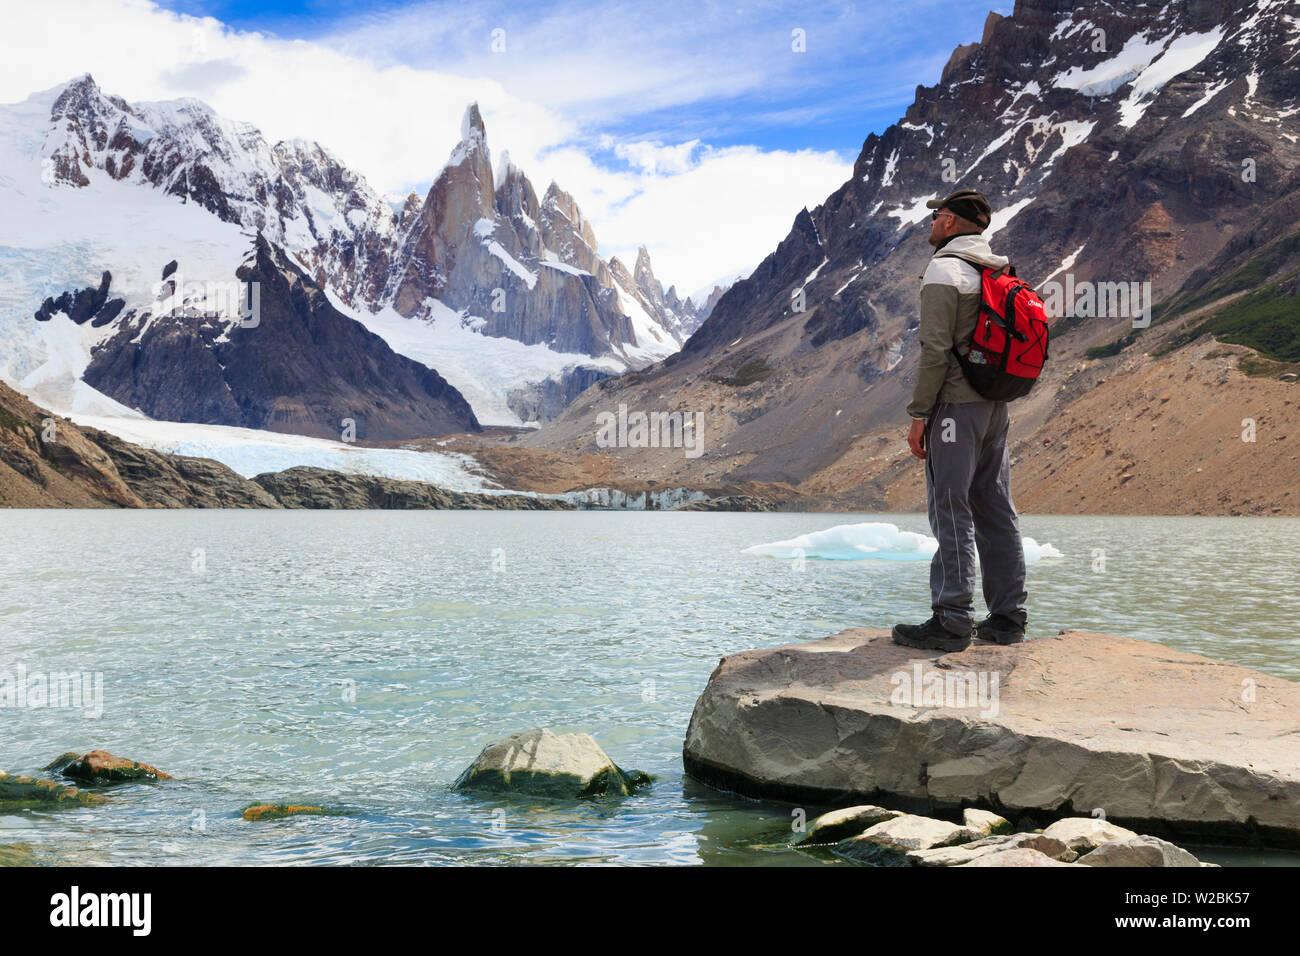 Argentina, Patagonia, El Chalten, Los Glaciares National Park, Laguna Torre and Cerro Torre Peak (MR) - Stock Image